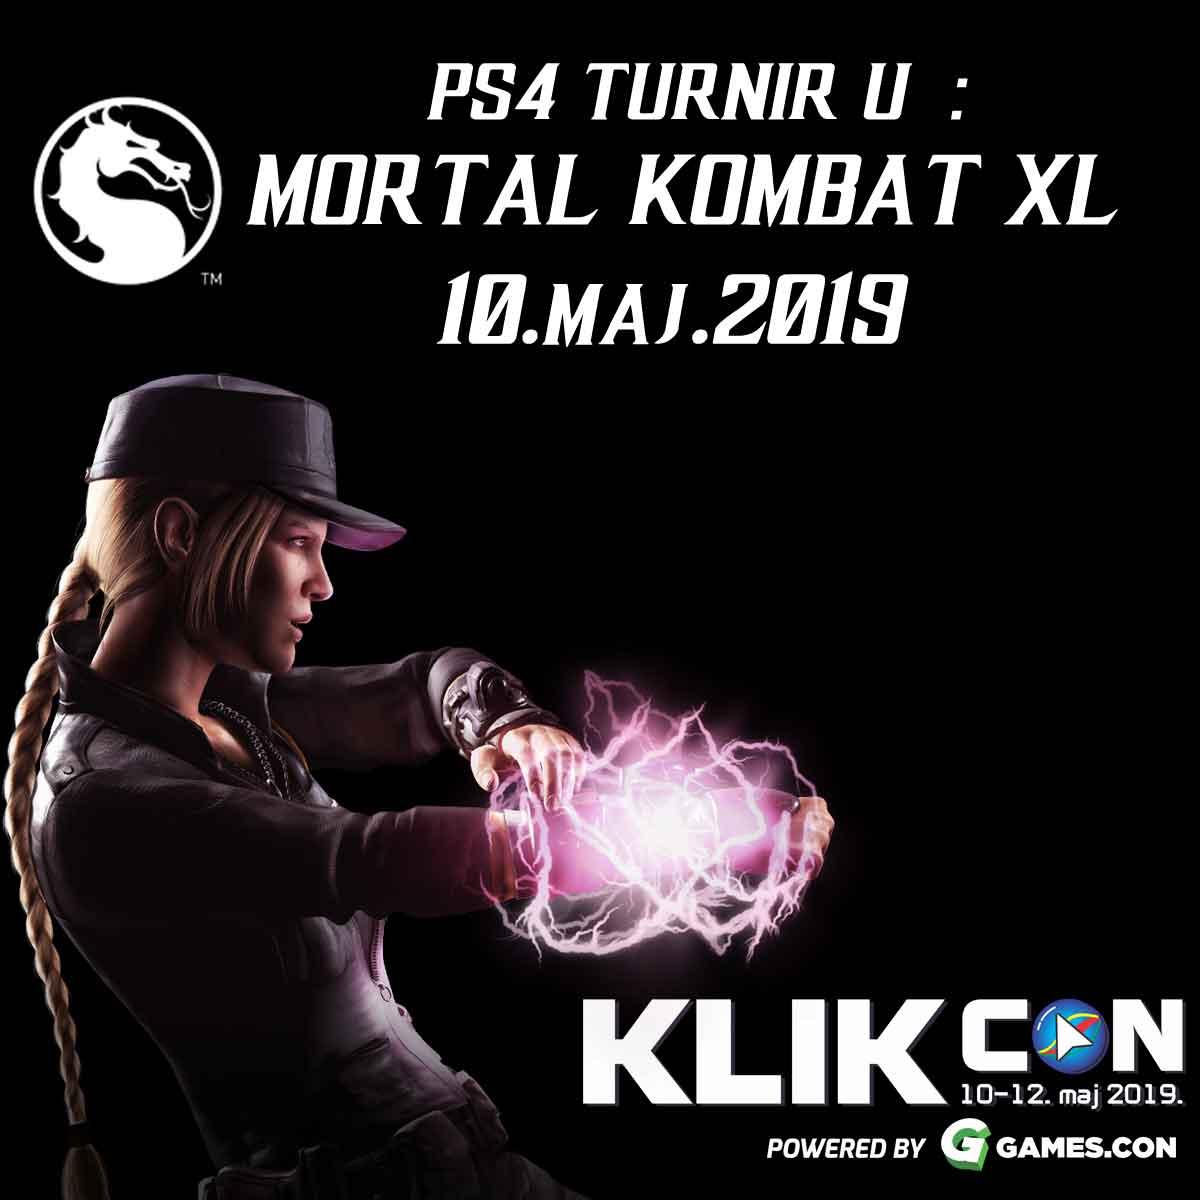 KlikCon Mortal kombat turnir